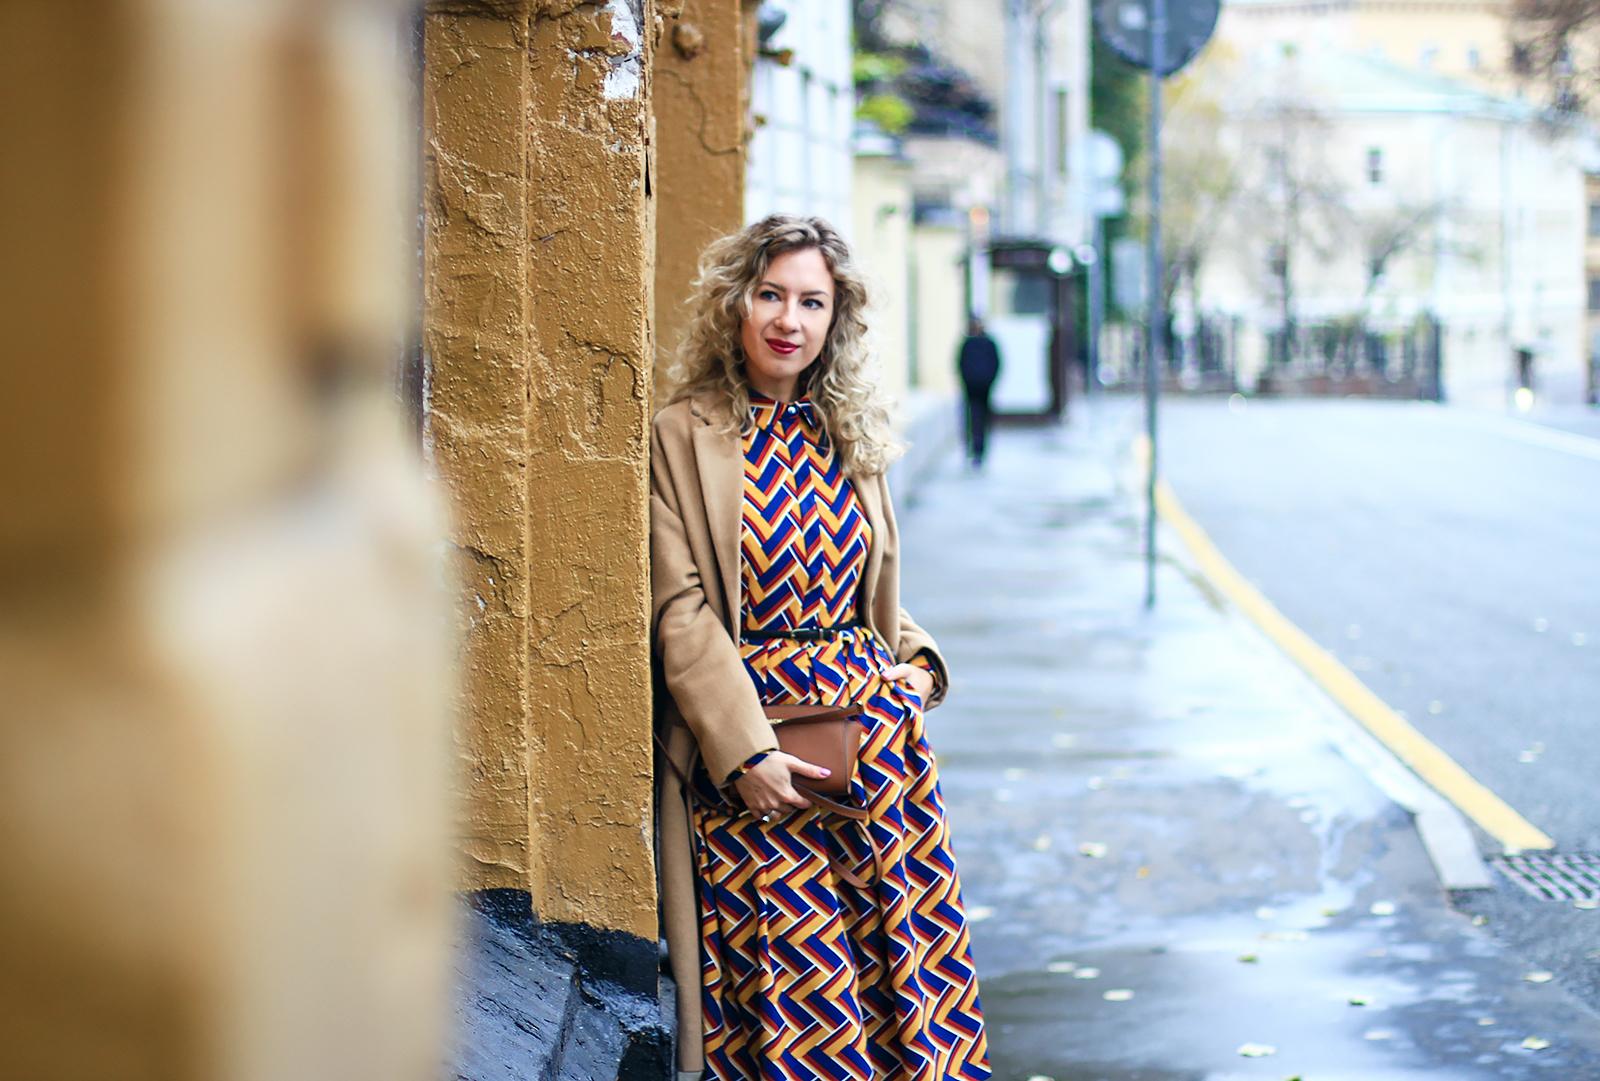 margarita_maslova_Spicy Mustard_dress_riverside_pantone_fall_look_streetstyle camel coat